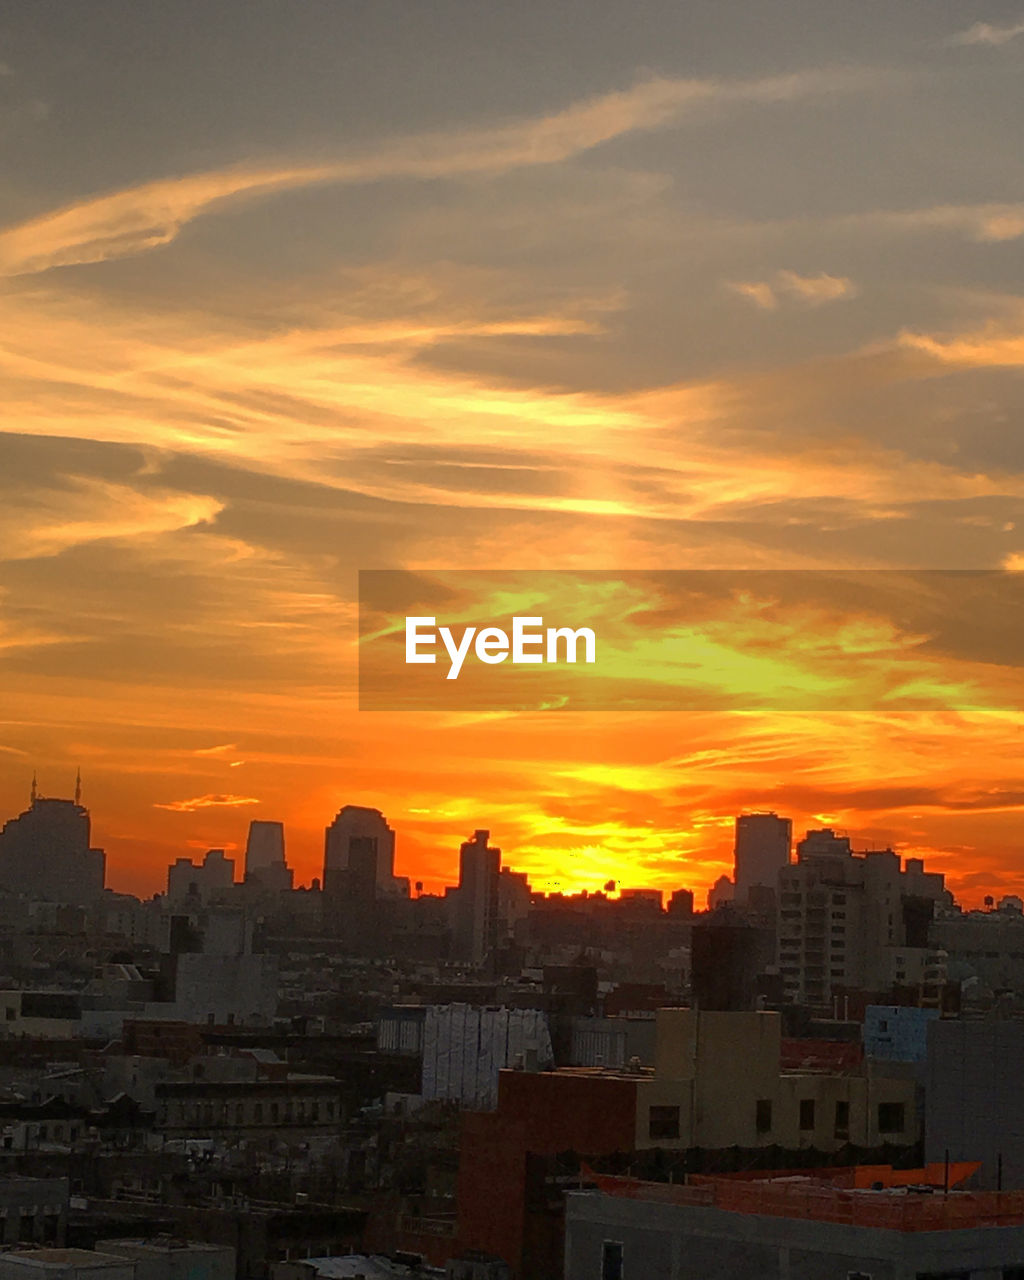 architecture, sunset, building exterior, built structure, cityscape, city, skyscraper, orange color, sky, urban skyline, travel destinations, no people, cloud - sky, outdoors, day